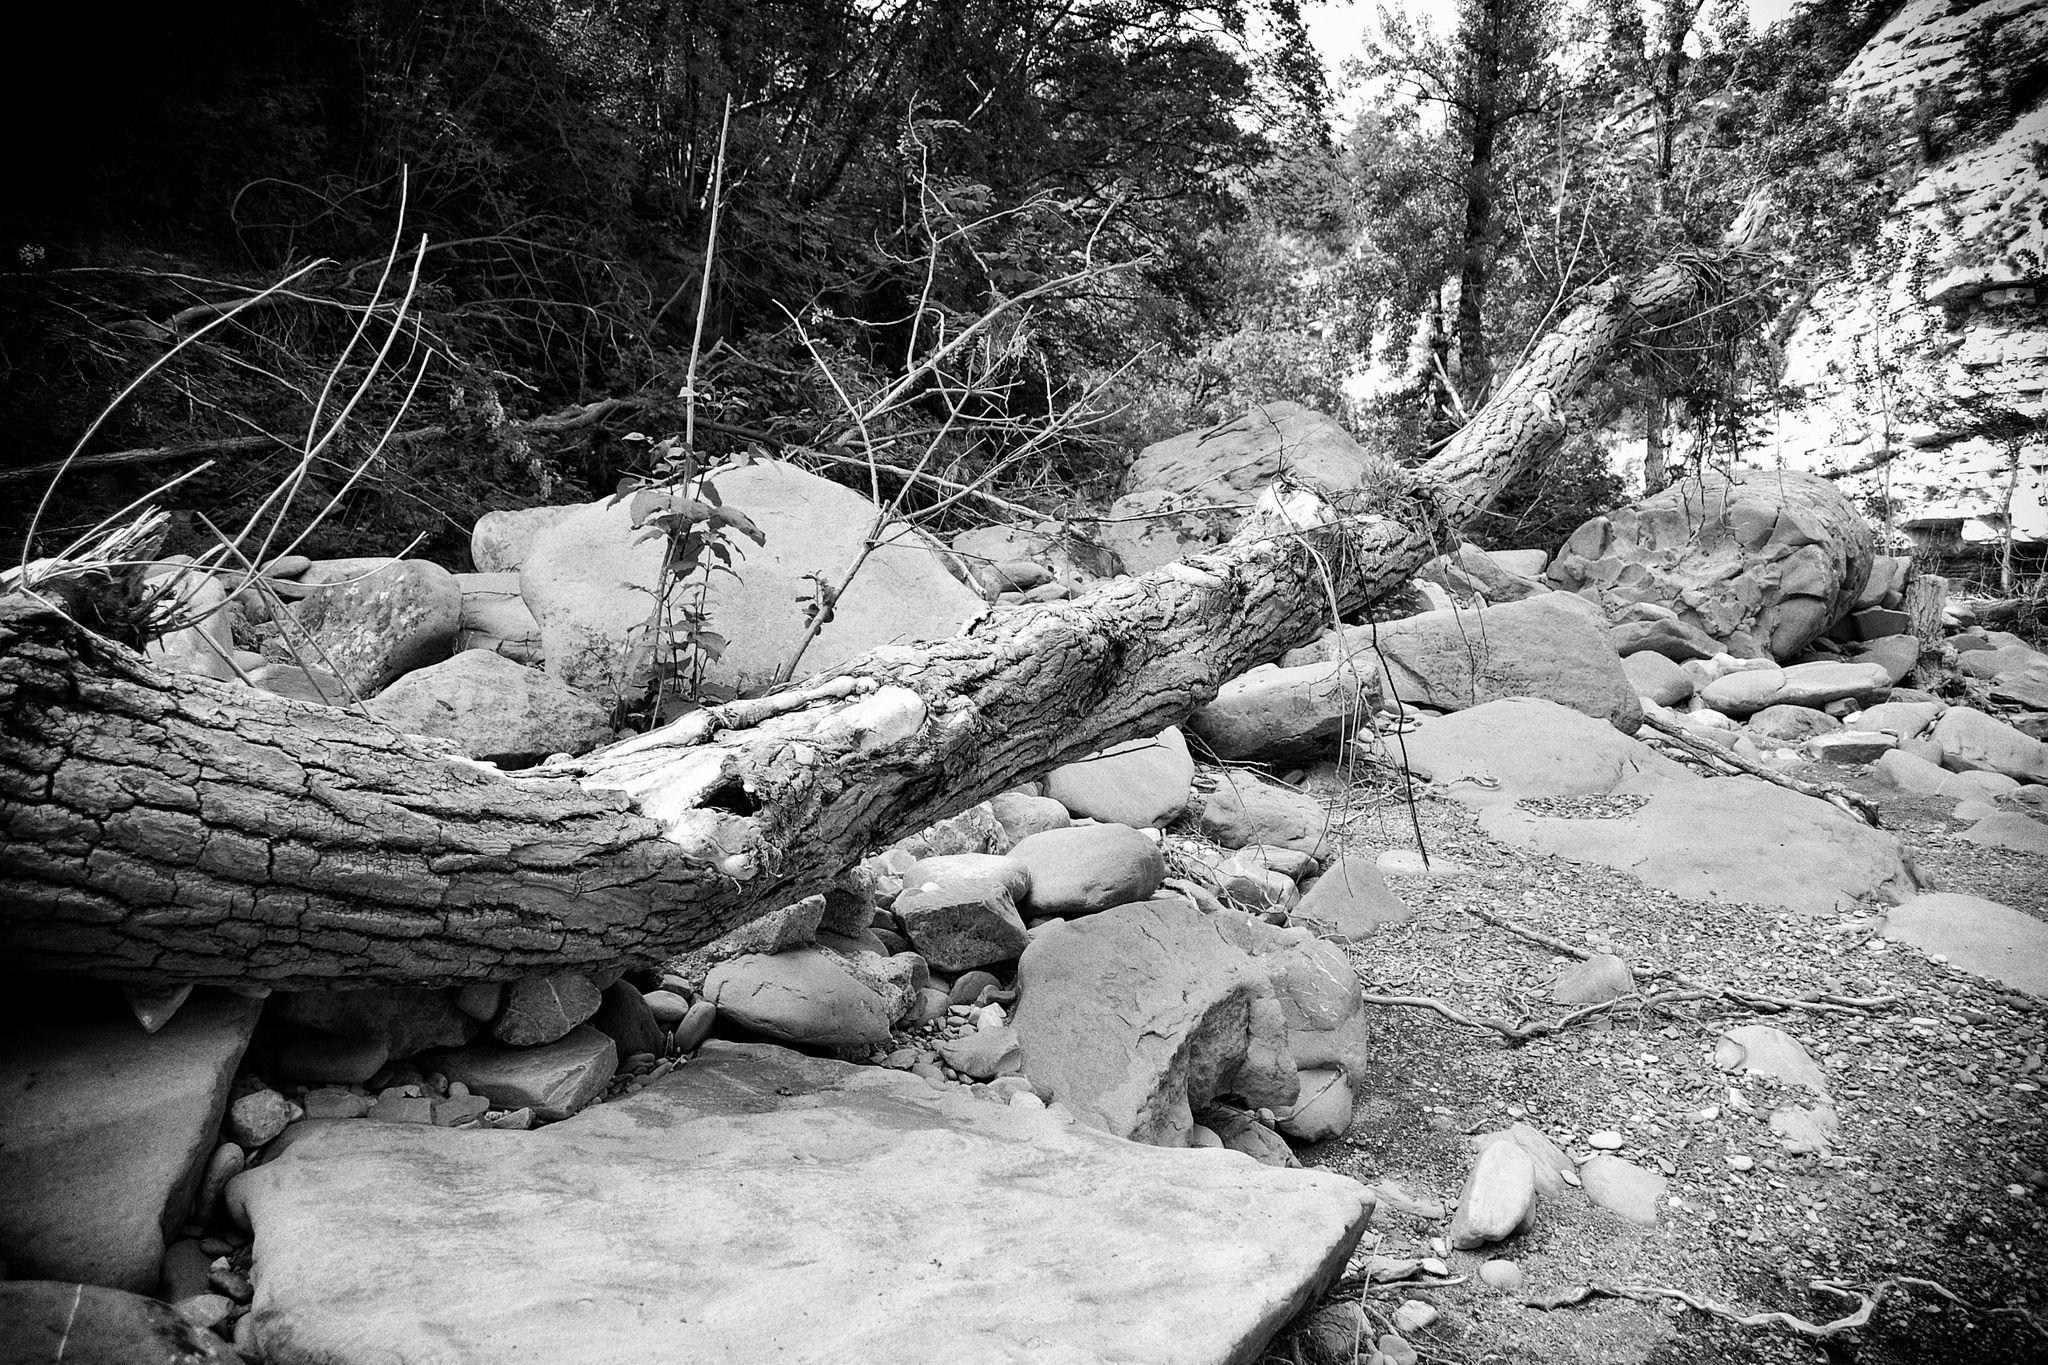 https://flic.kr/p/t8Hbh8 | Tronco al fiume | Santerno